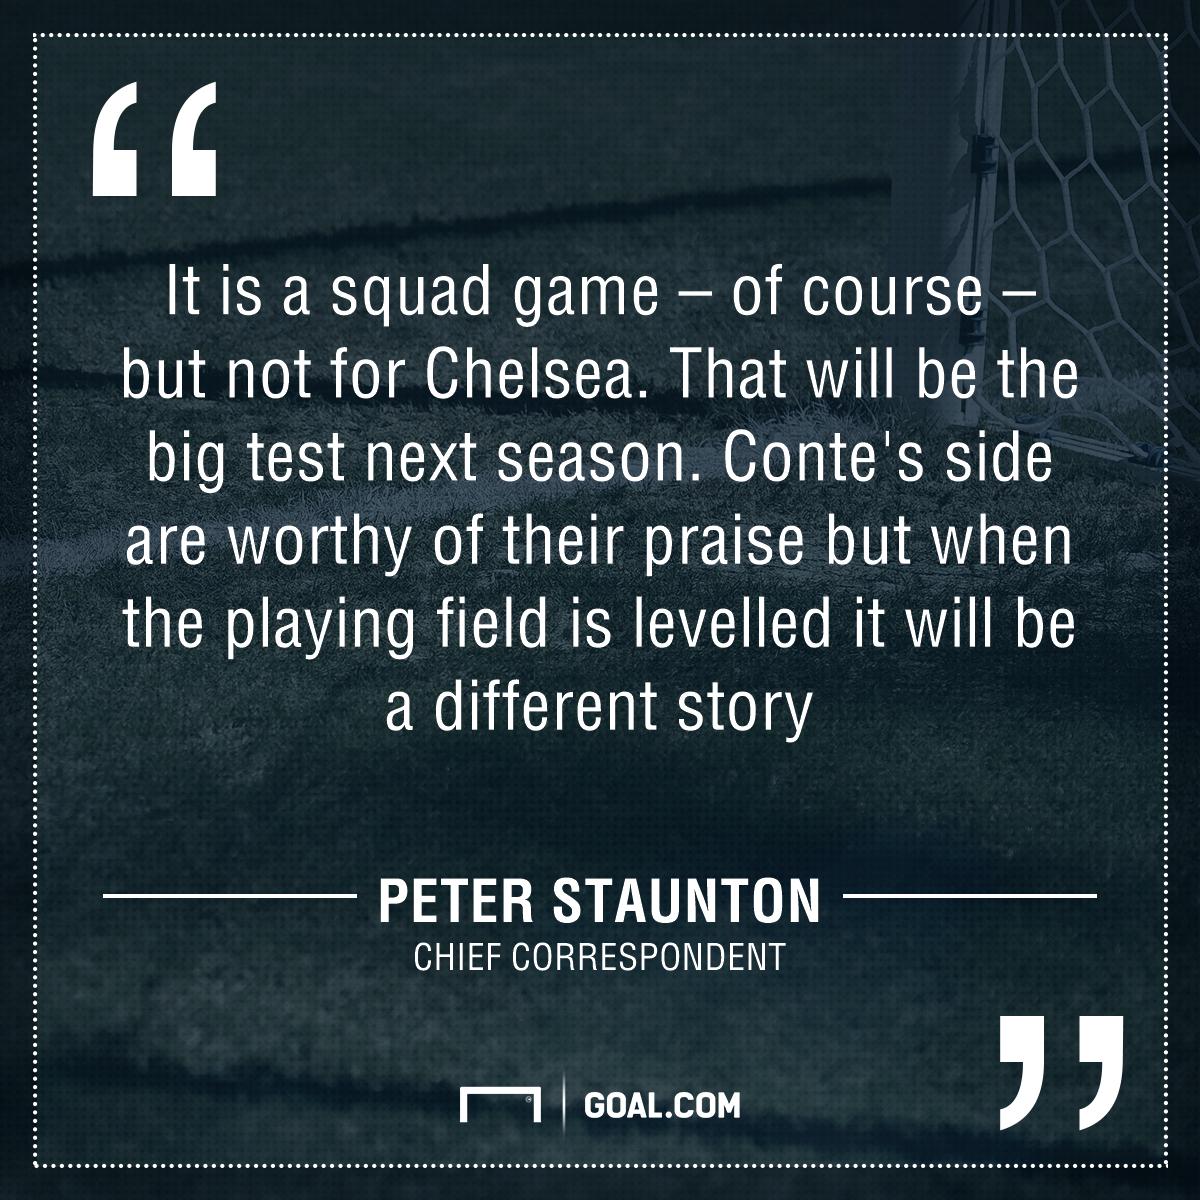 Staunton Chelsea quote